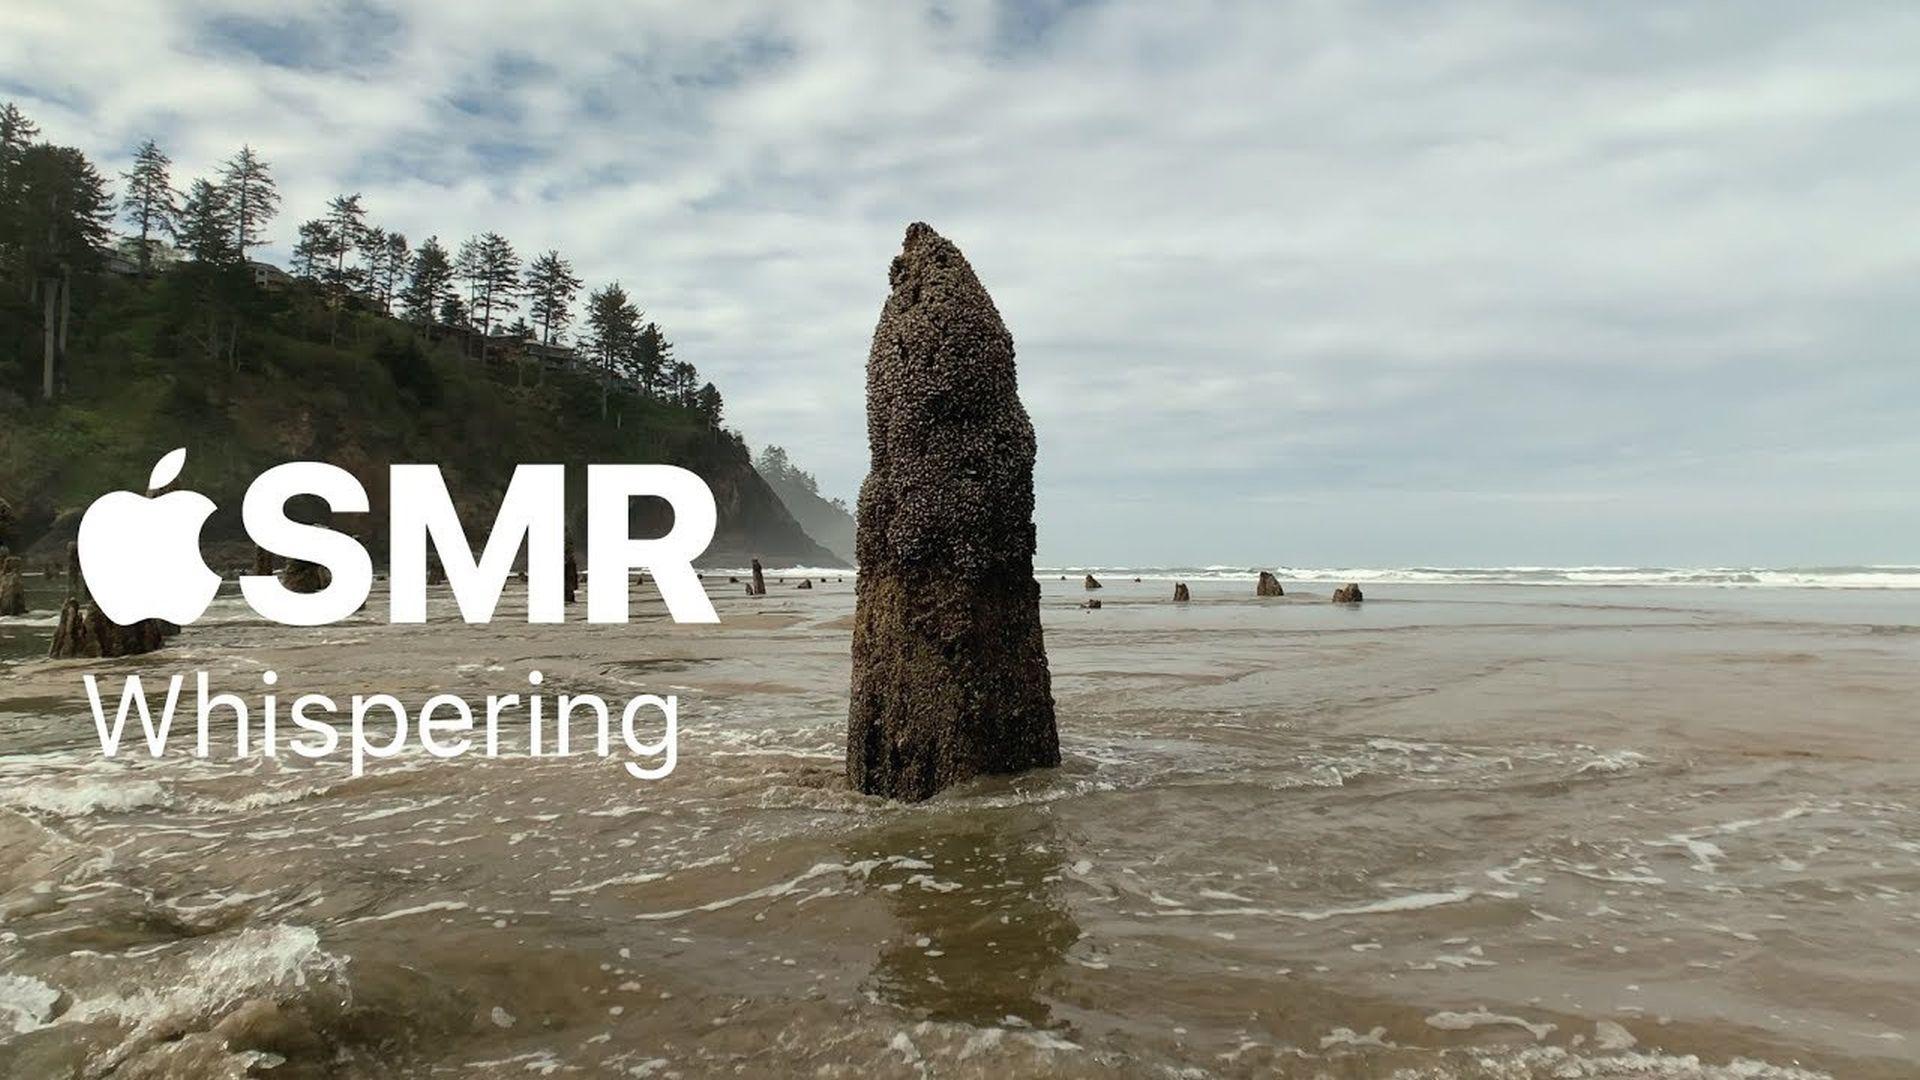 Apple opublikowała nowe filmy ASMR z serii Shot on iPhone